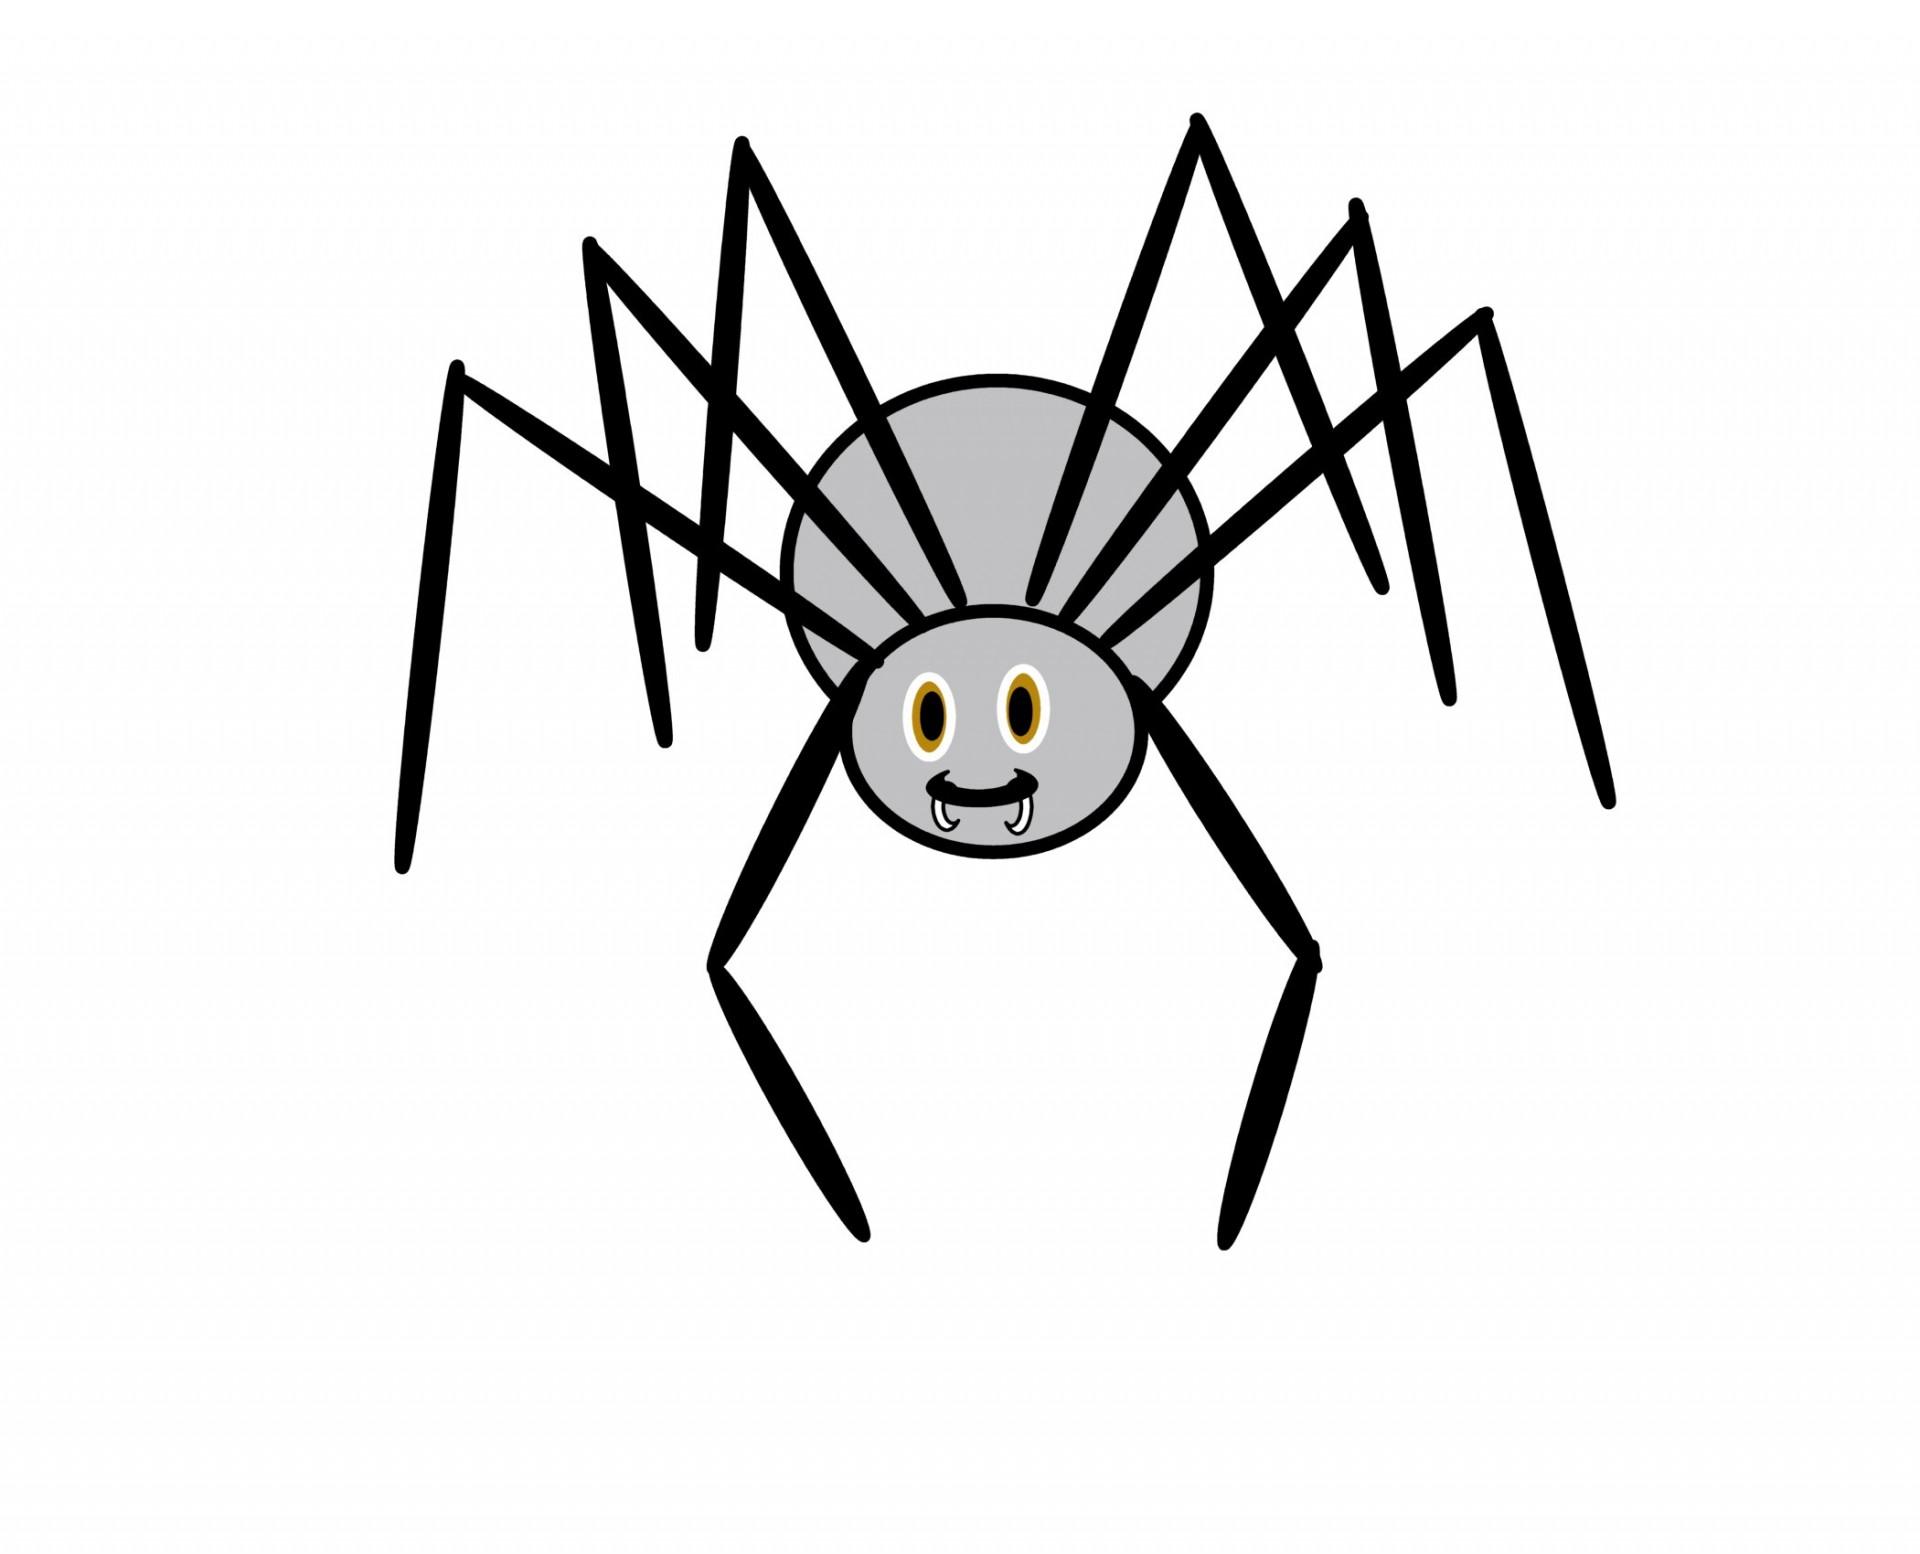 Clip Art Spider Free Stock Photo